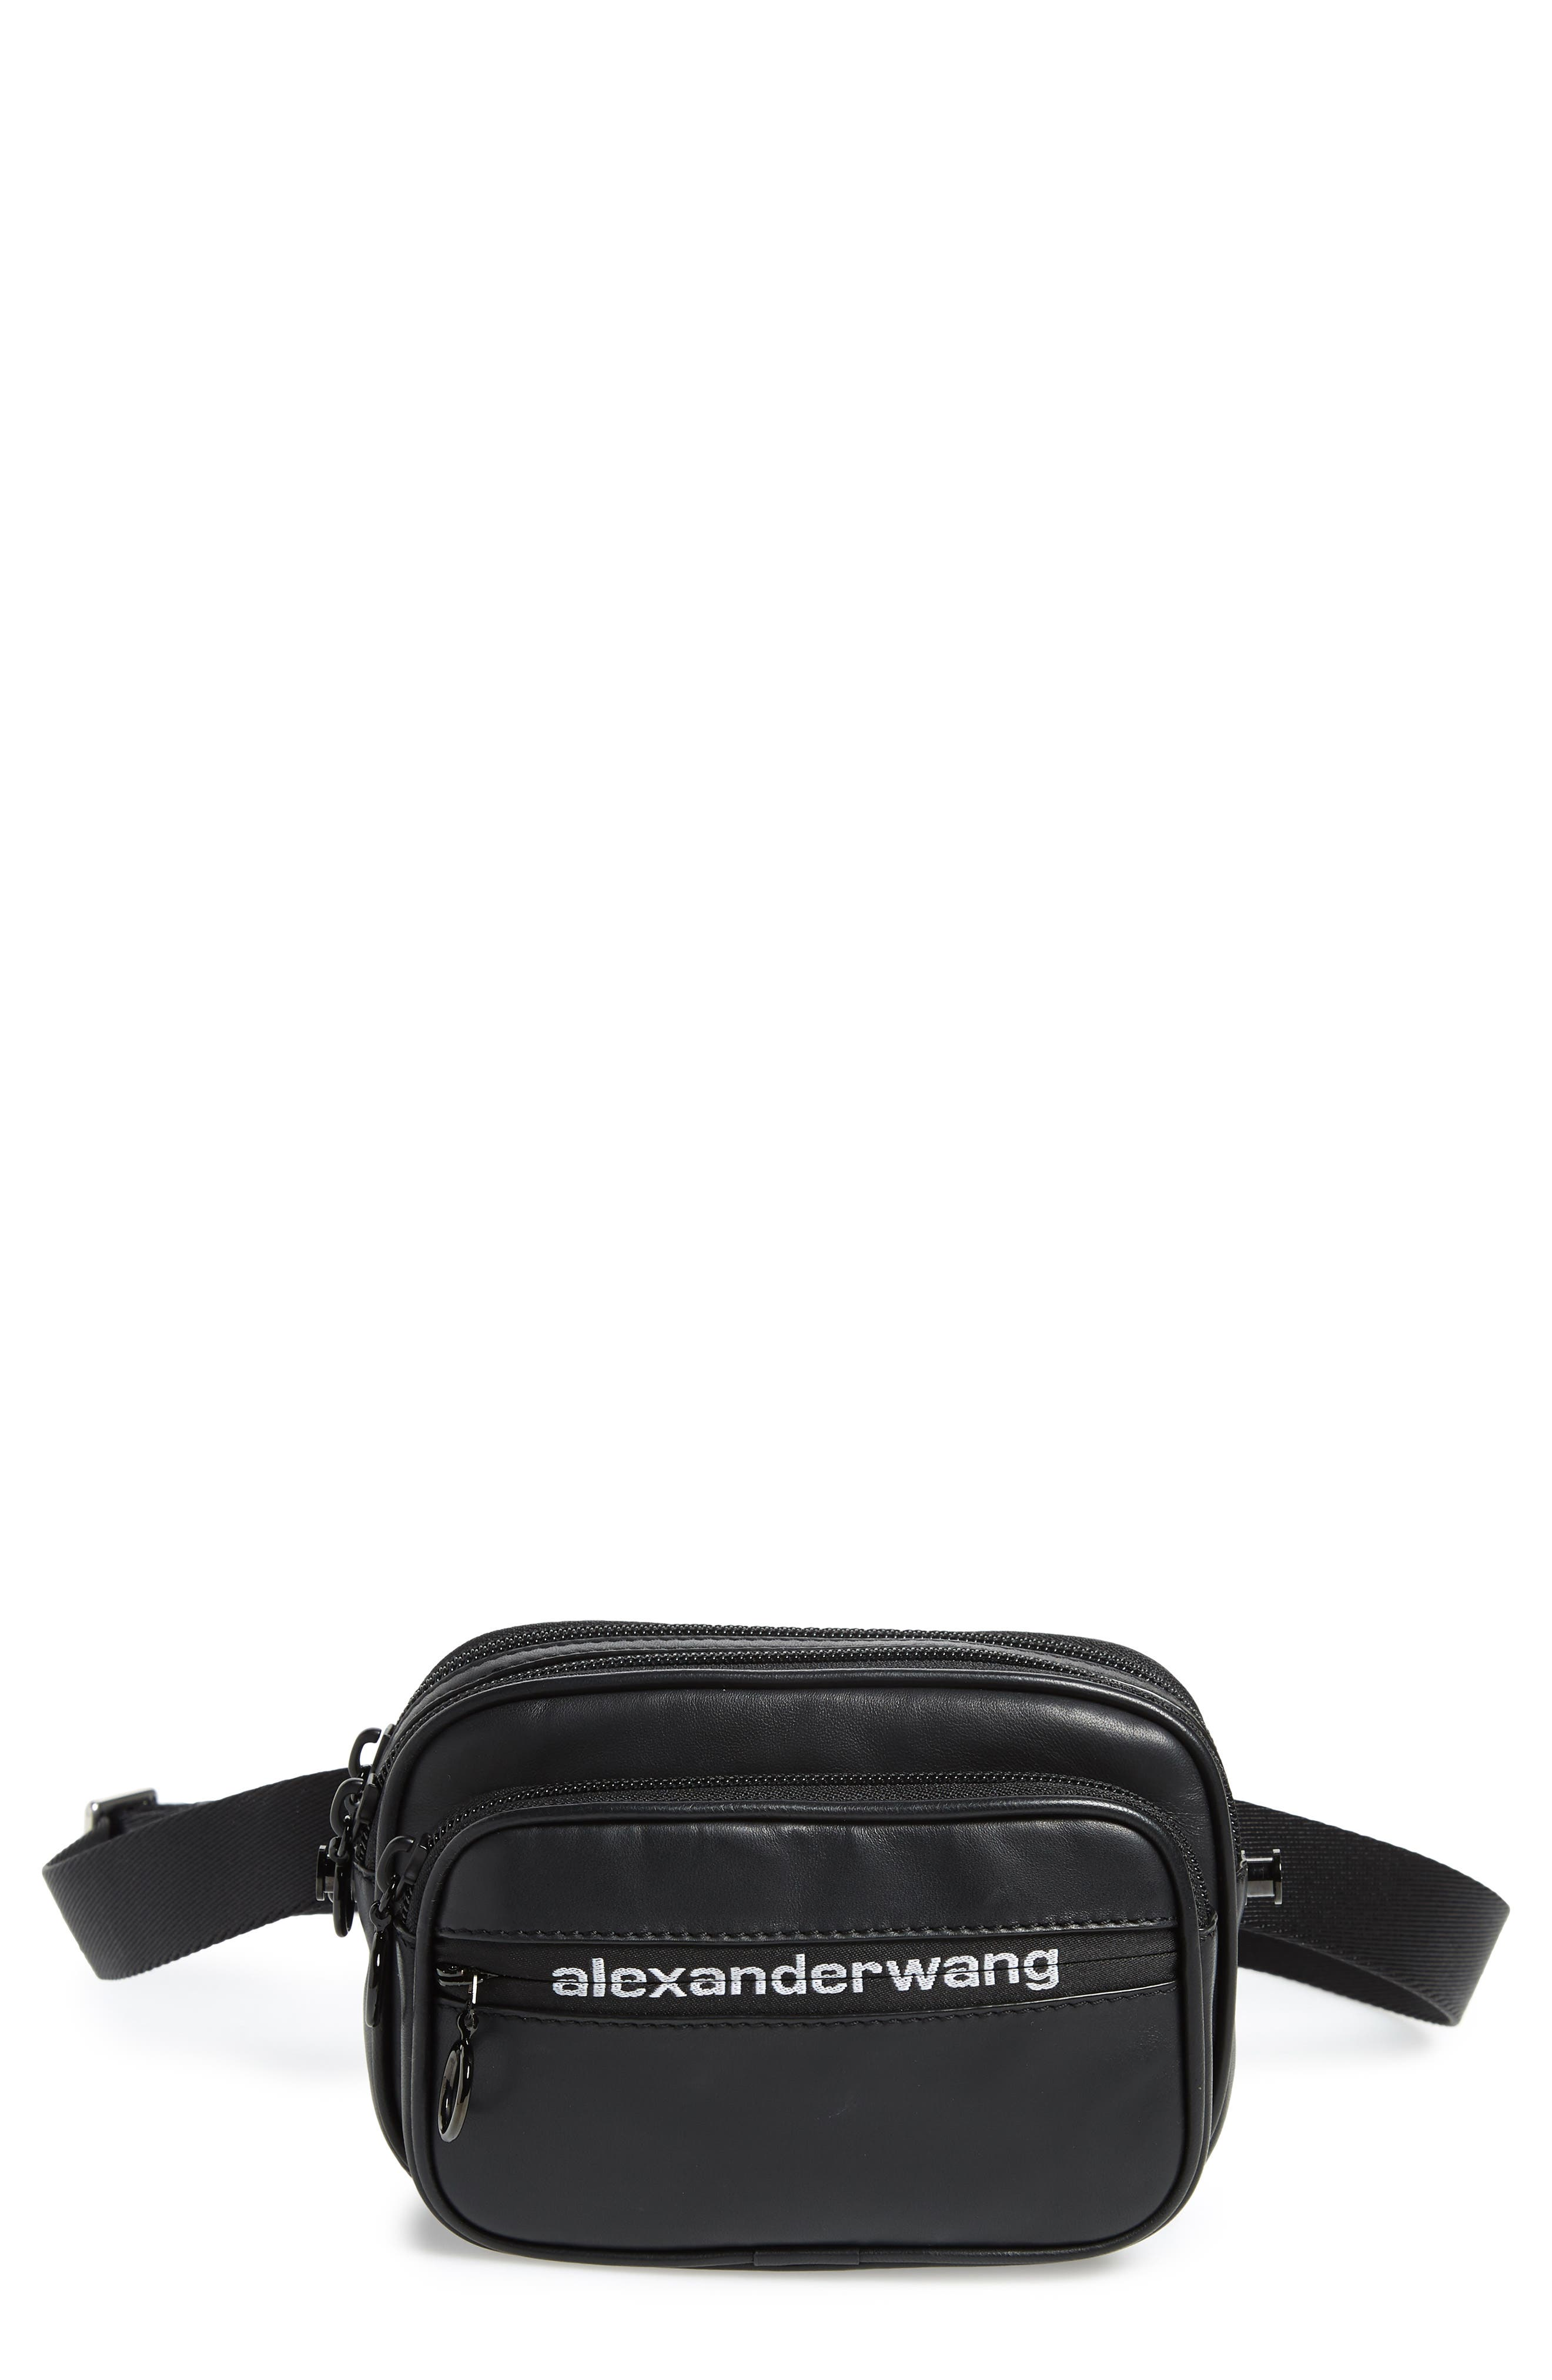 ALEXANDER WANG, Attica Logo Leather Belt Bag, Main thumbnail 1, color, BLACK